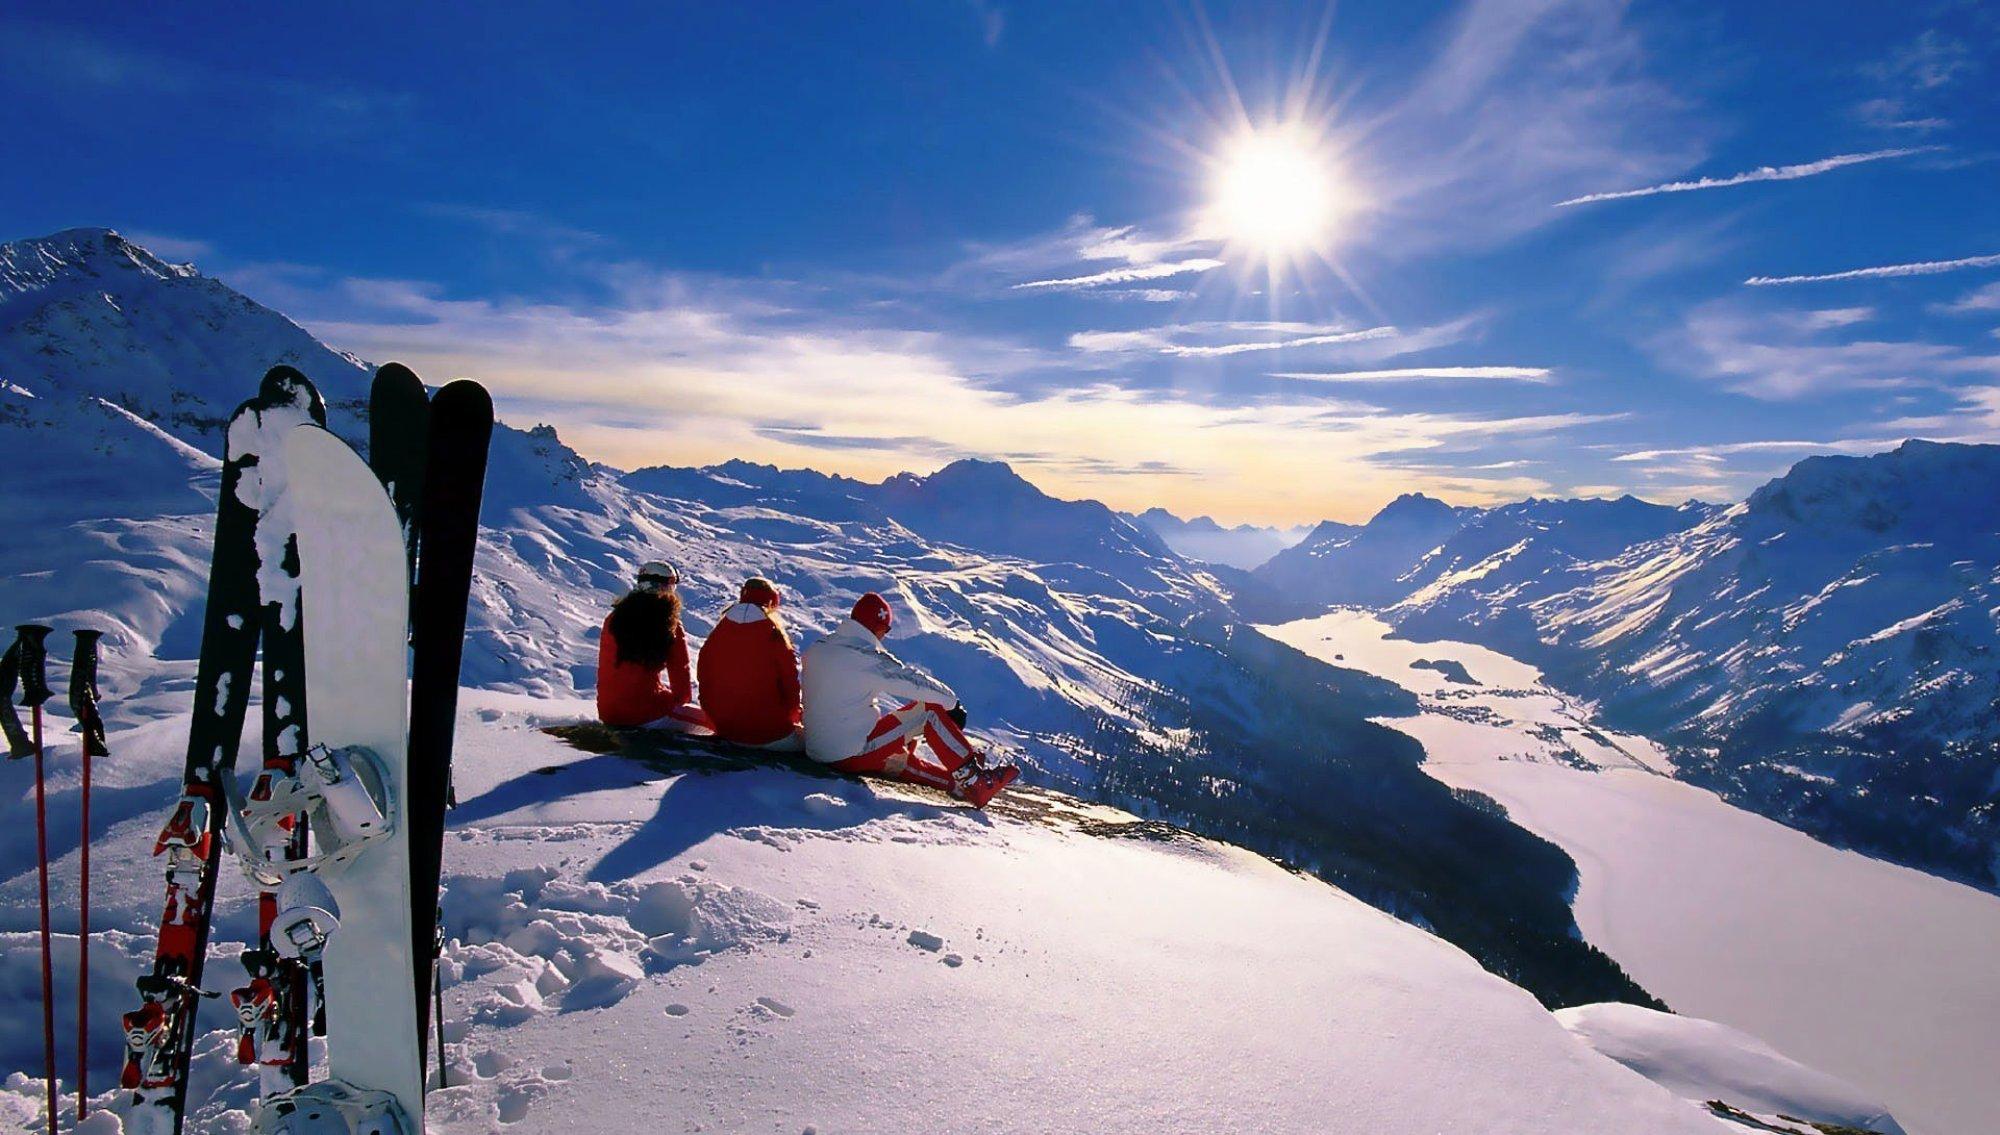 зимняя швейцария фото